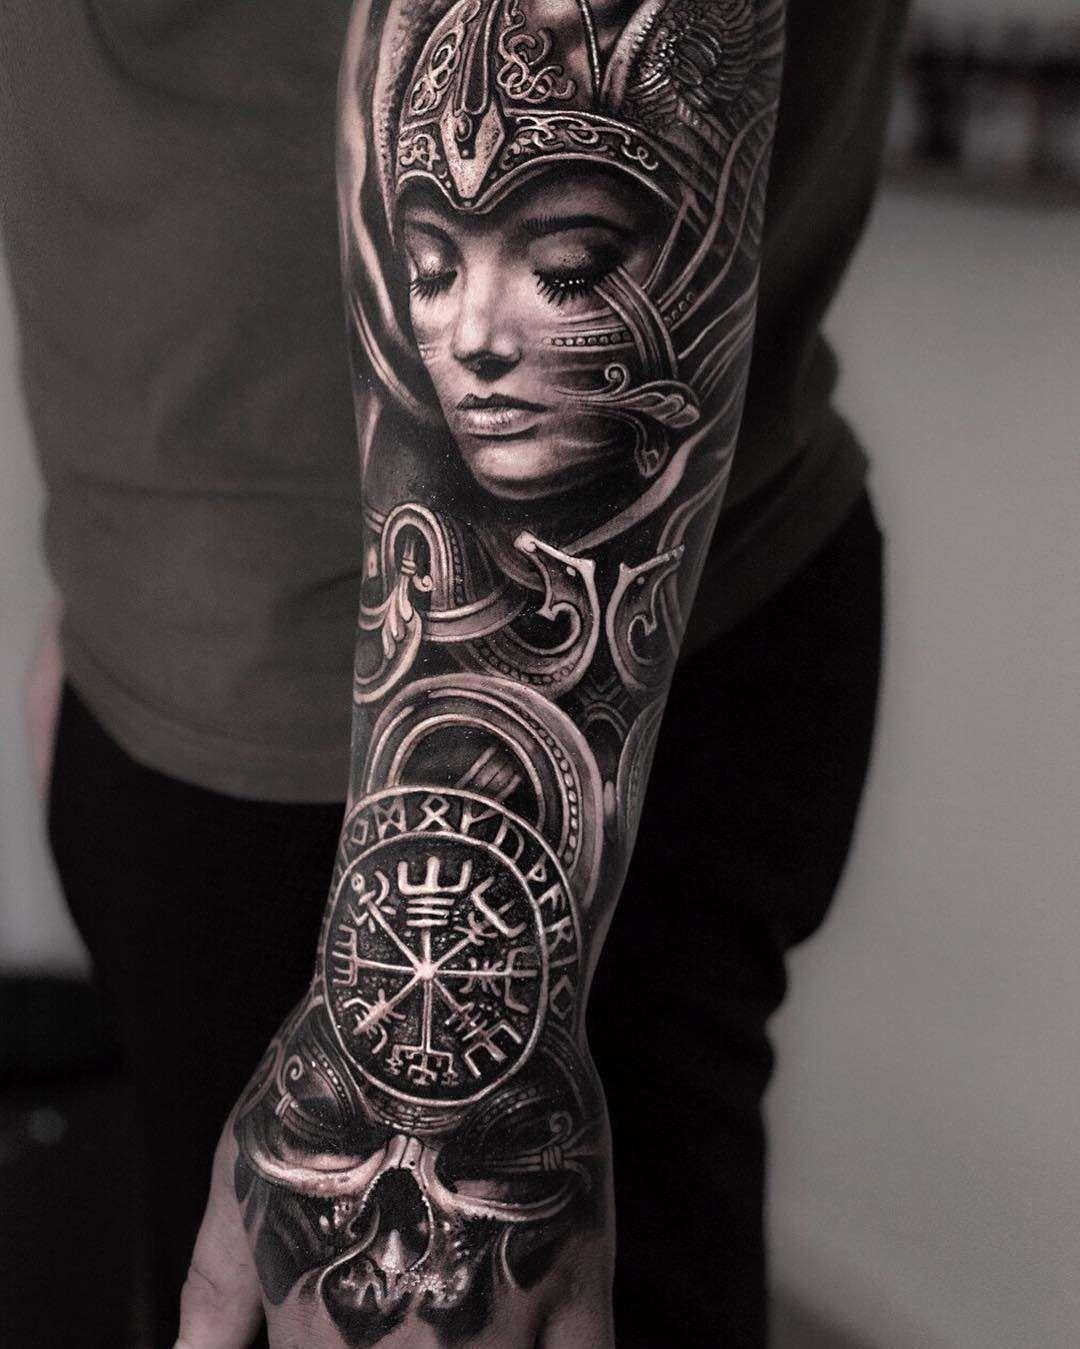 Ideas for Viking Tattoos in 2020 Valkyrie tattoo, Viking